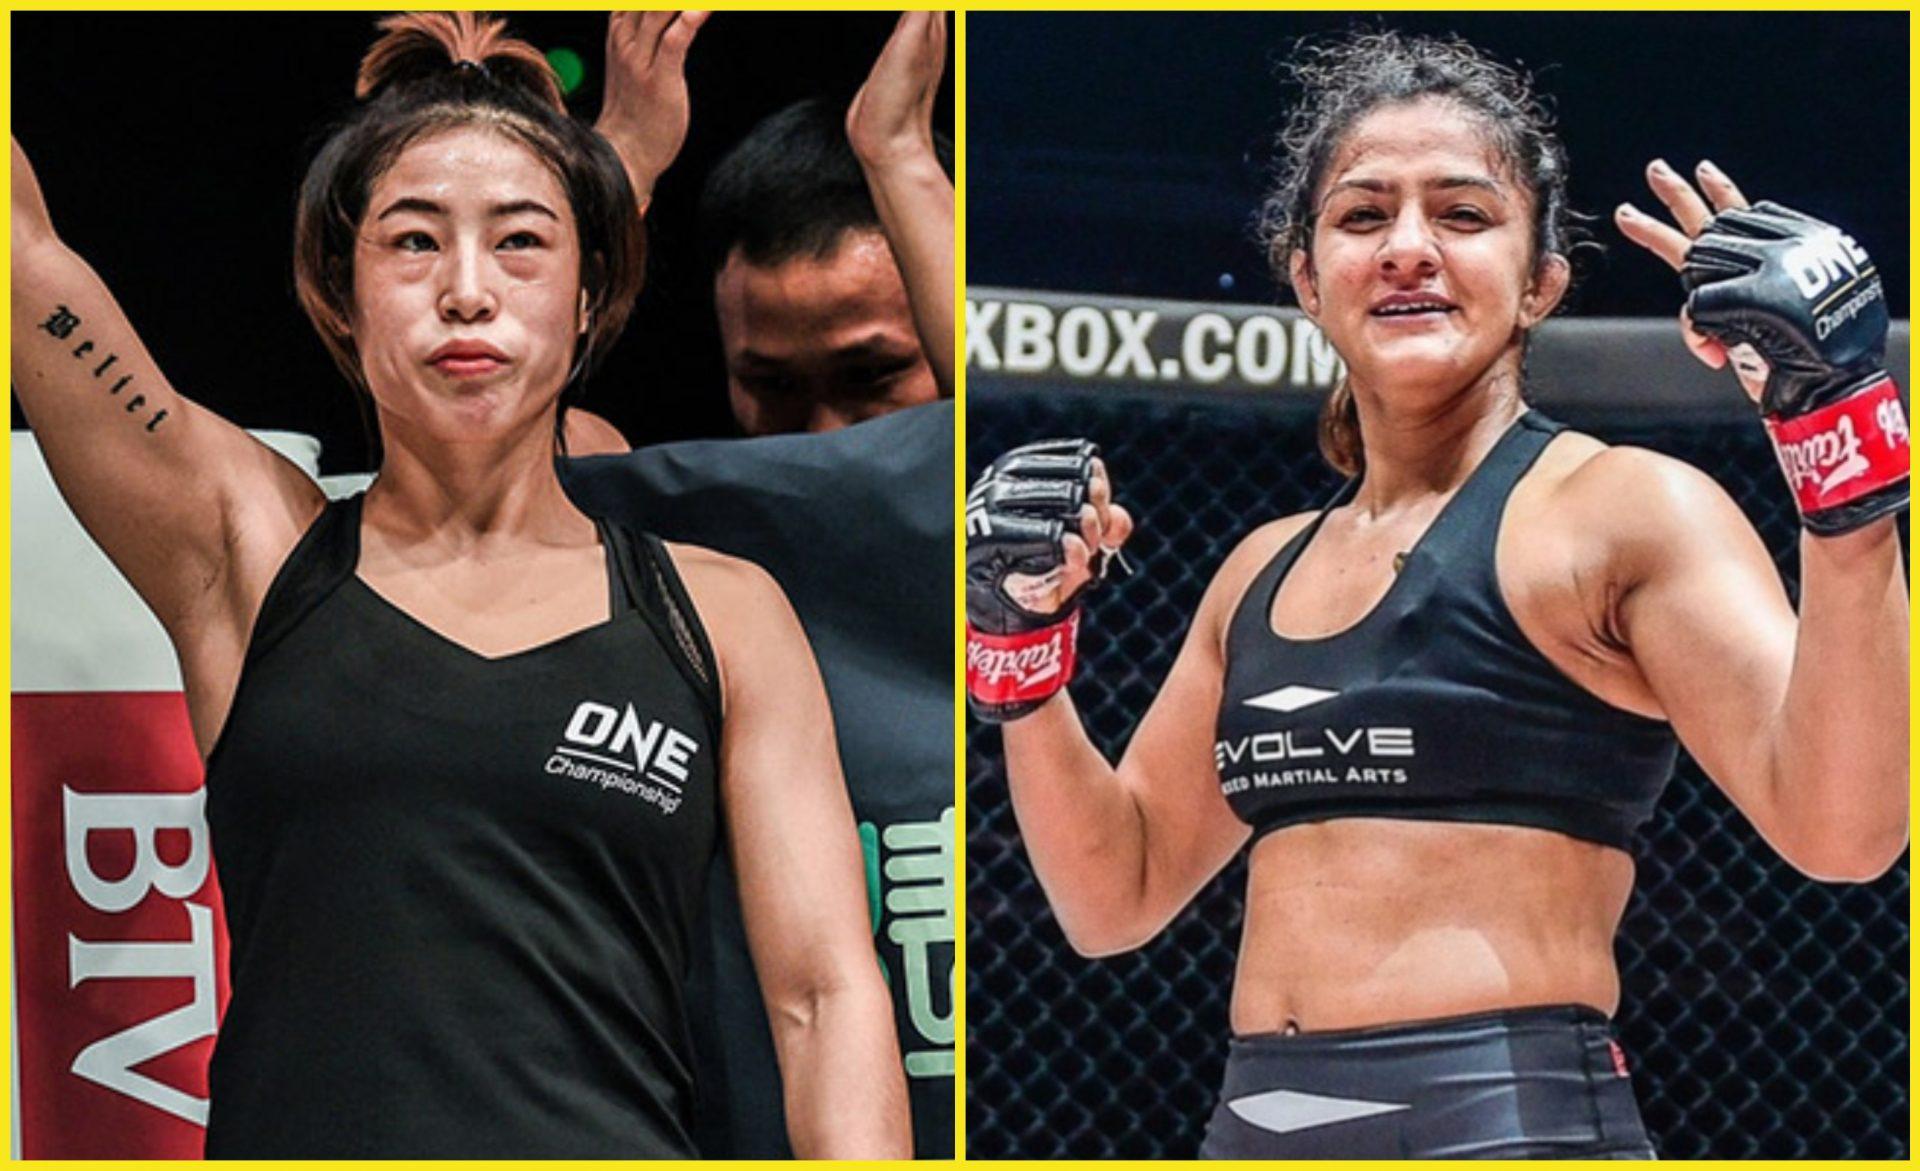 Indian MMA star Ritu Phogat to fight China's Meng Bo at ONE Championship on May 28 - Ritu Phogat